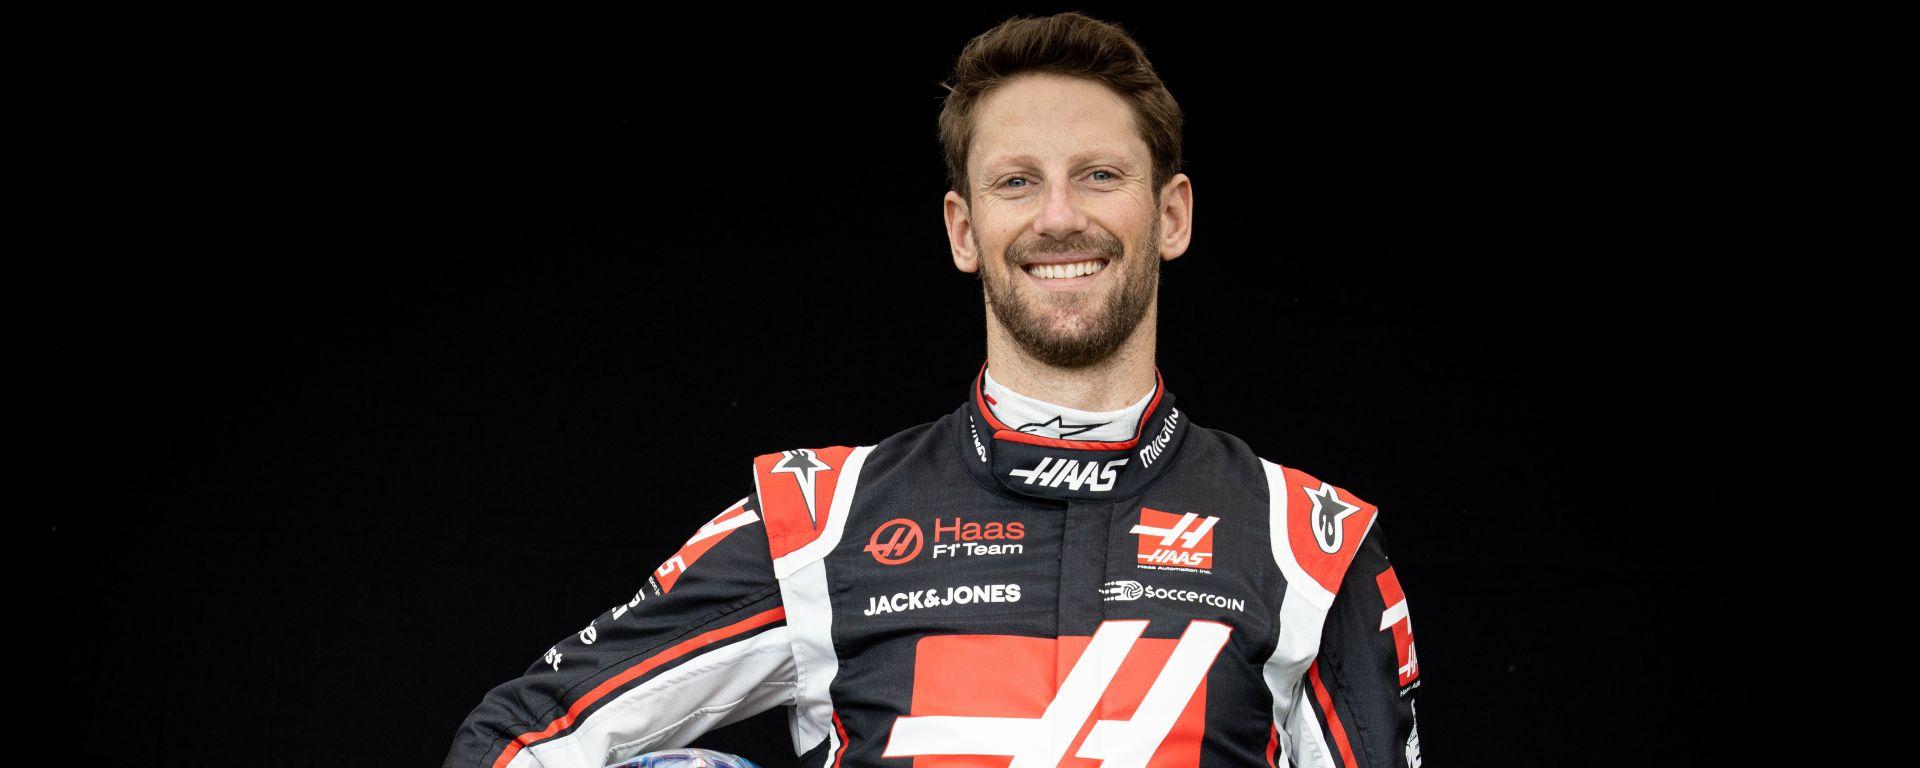 F1 GP Australia 2020, Melbourne: Romain Grosjean (Haas F1 Team)